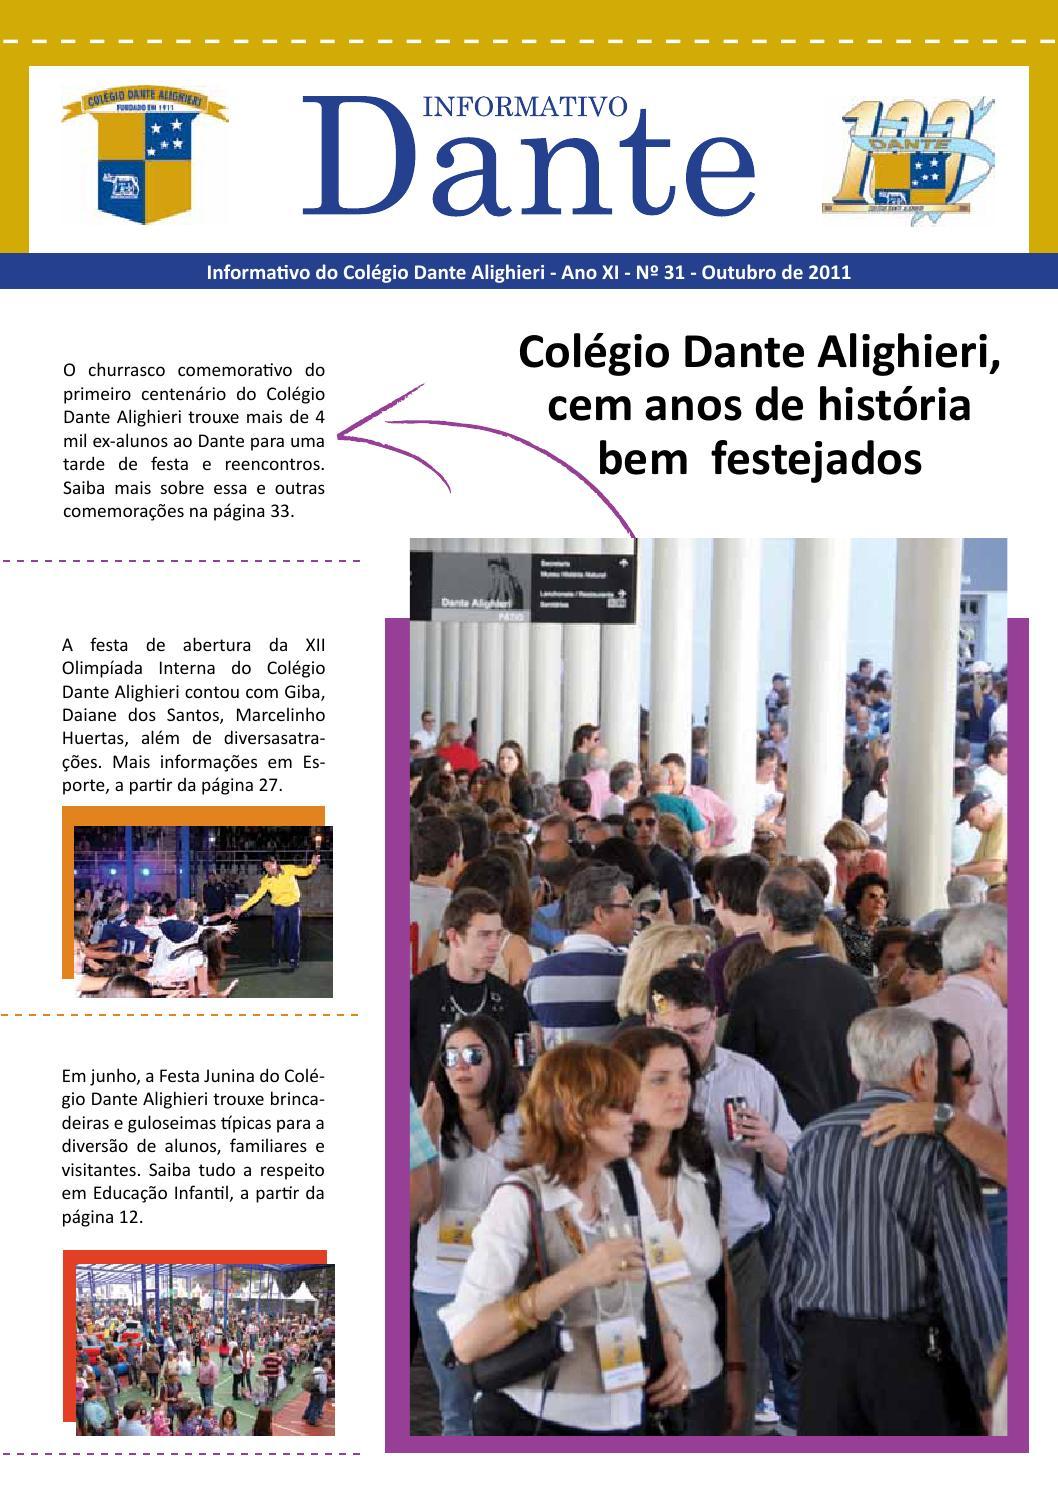 Colégio Dante Alighieri - Informativo n.º 31 by Bruno Gonçalves - issuu 0bce959a4cbf5